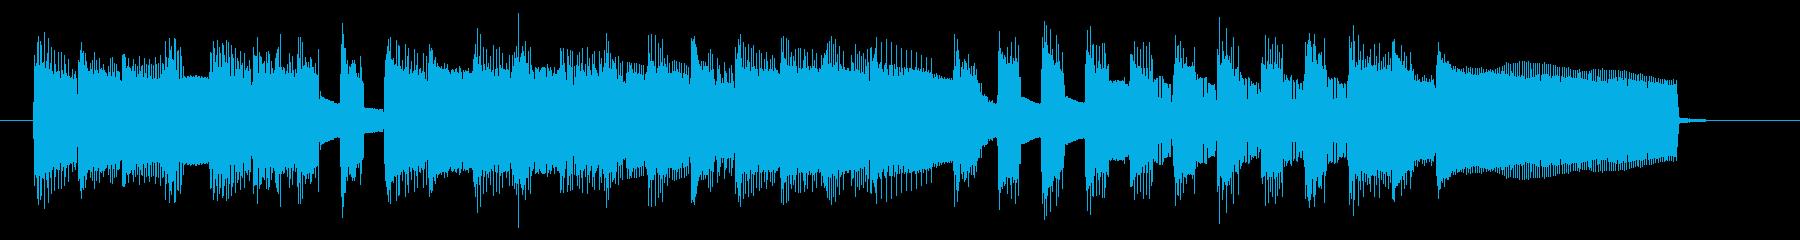 NES STG C07-2(クリア2)の再生済みの波形